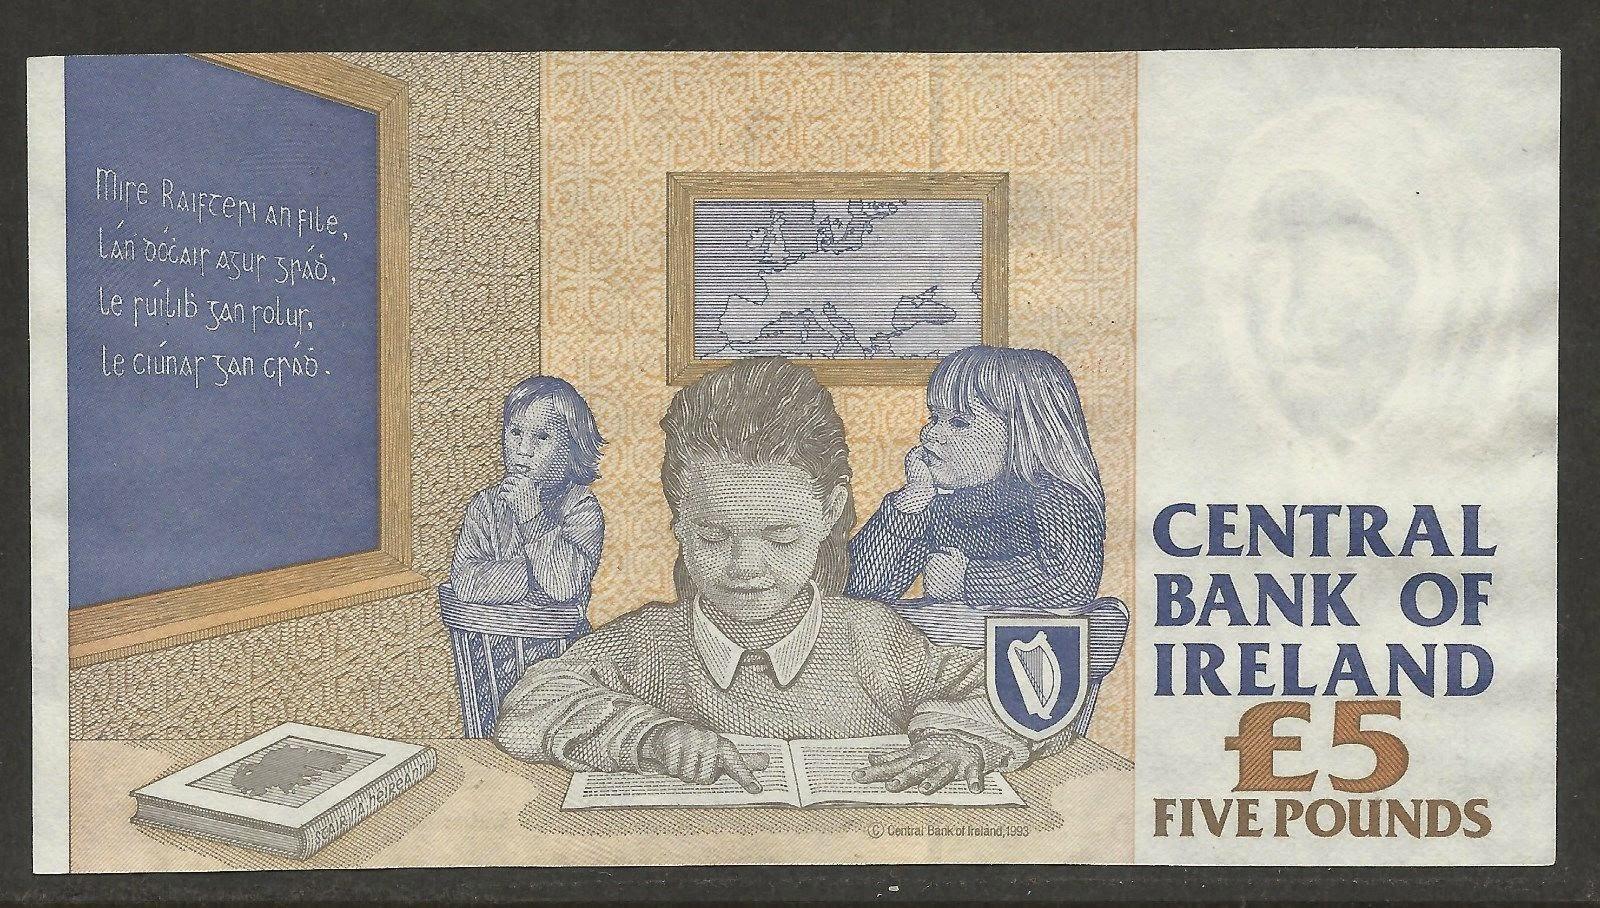 Currency Ireland 5 Irish Pounds banknote bill